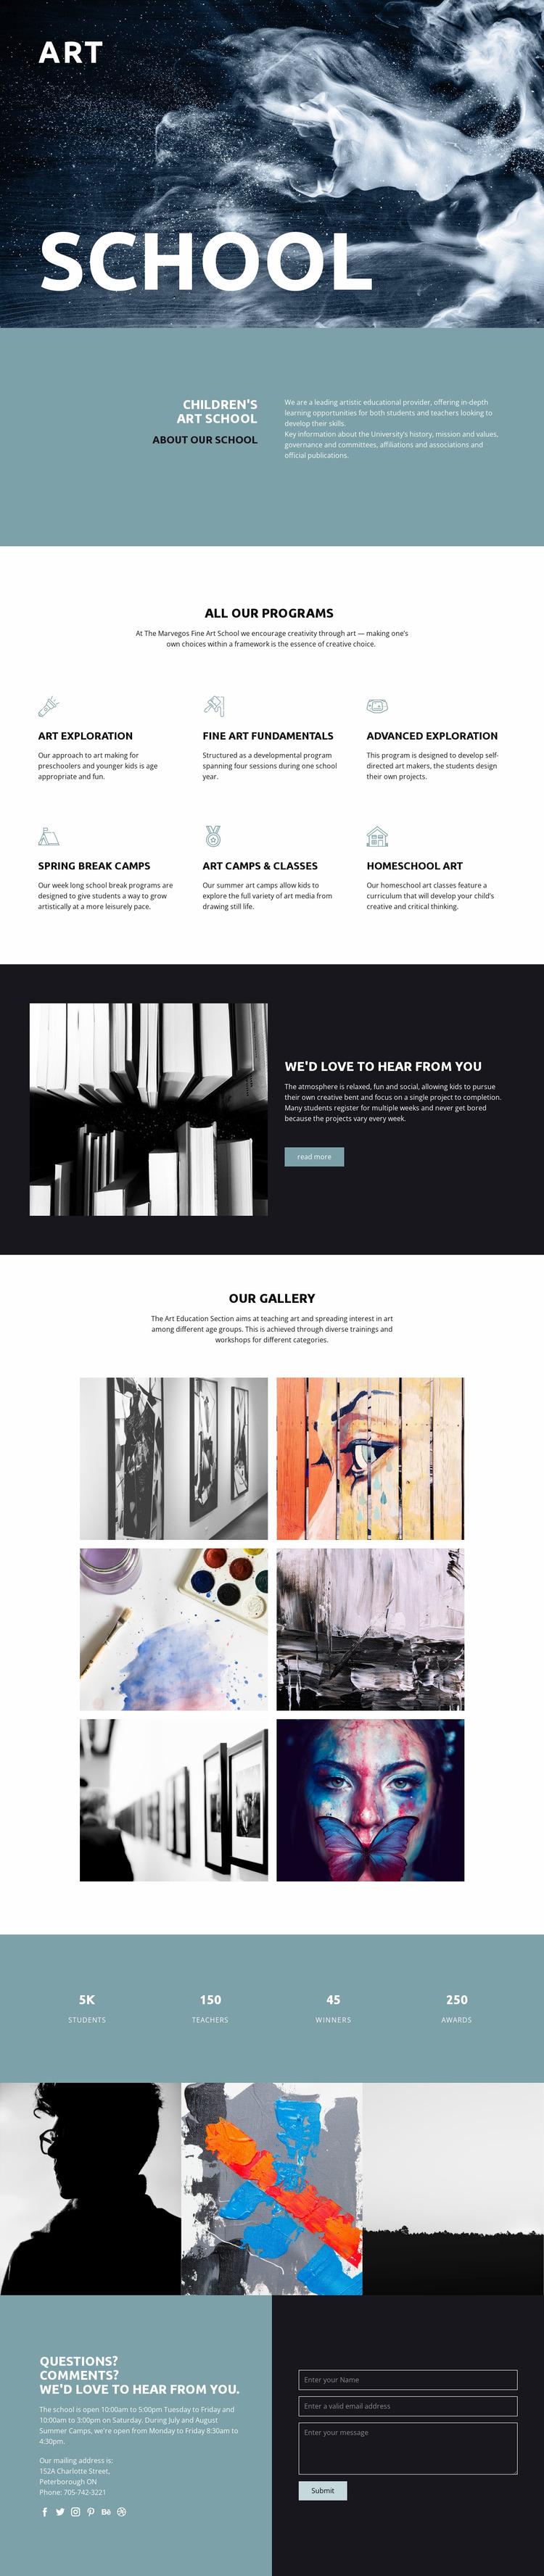 School of artistic education Website Mockup